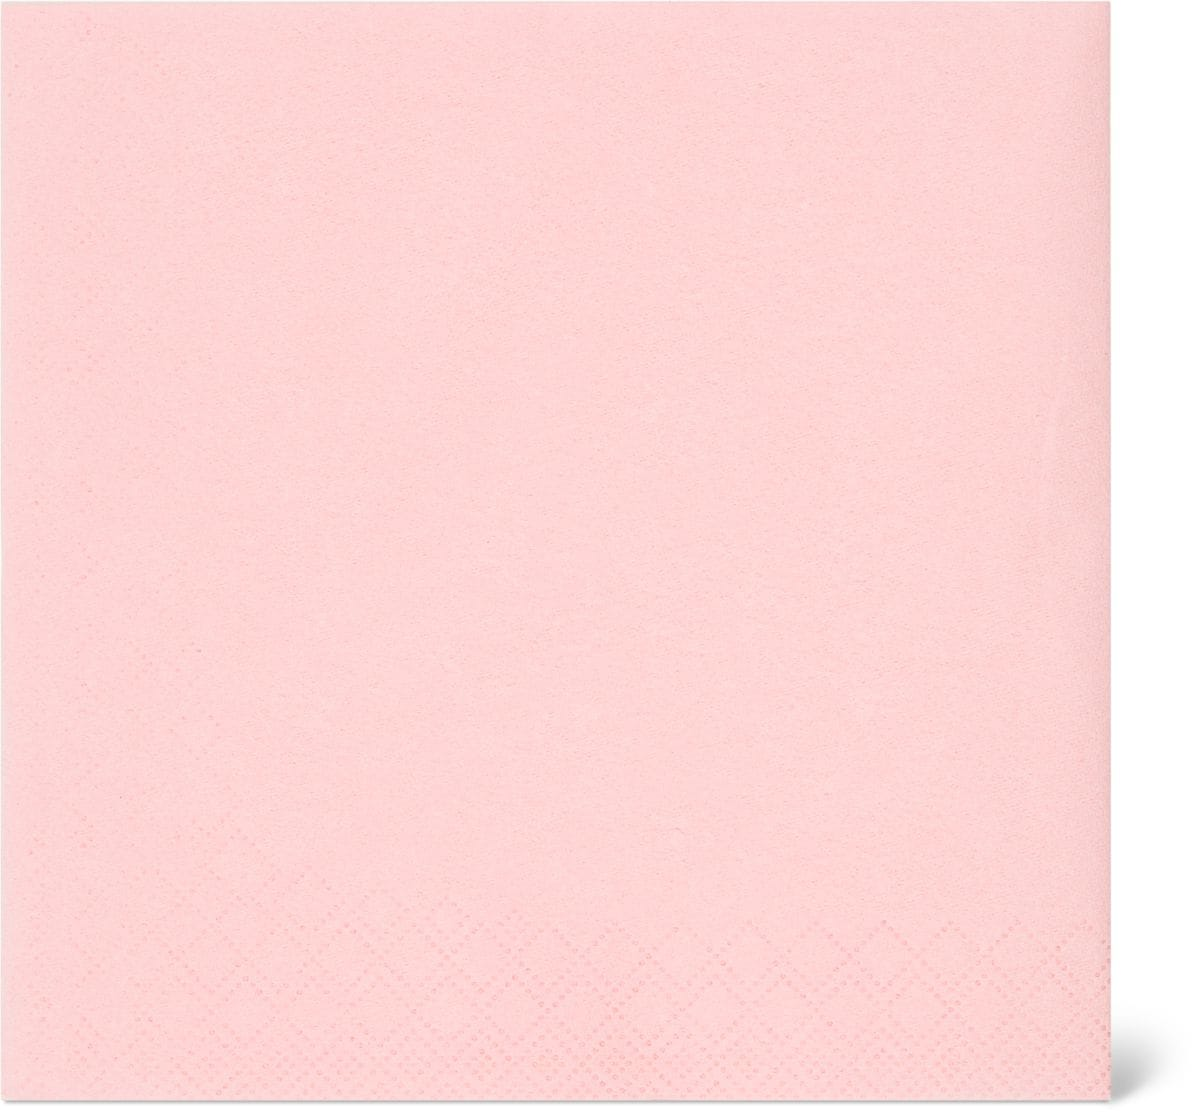 Cucina & Tavola Papierservietten, 33x33cm